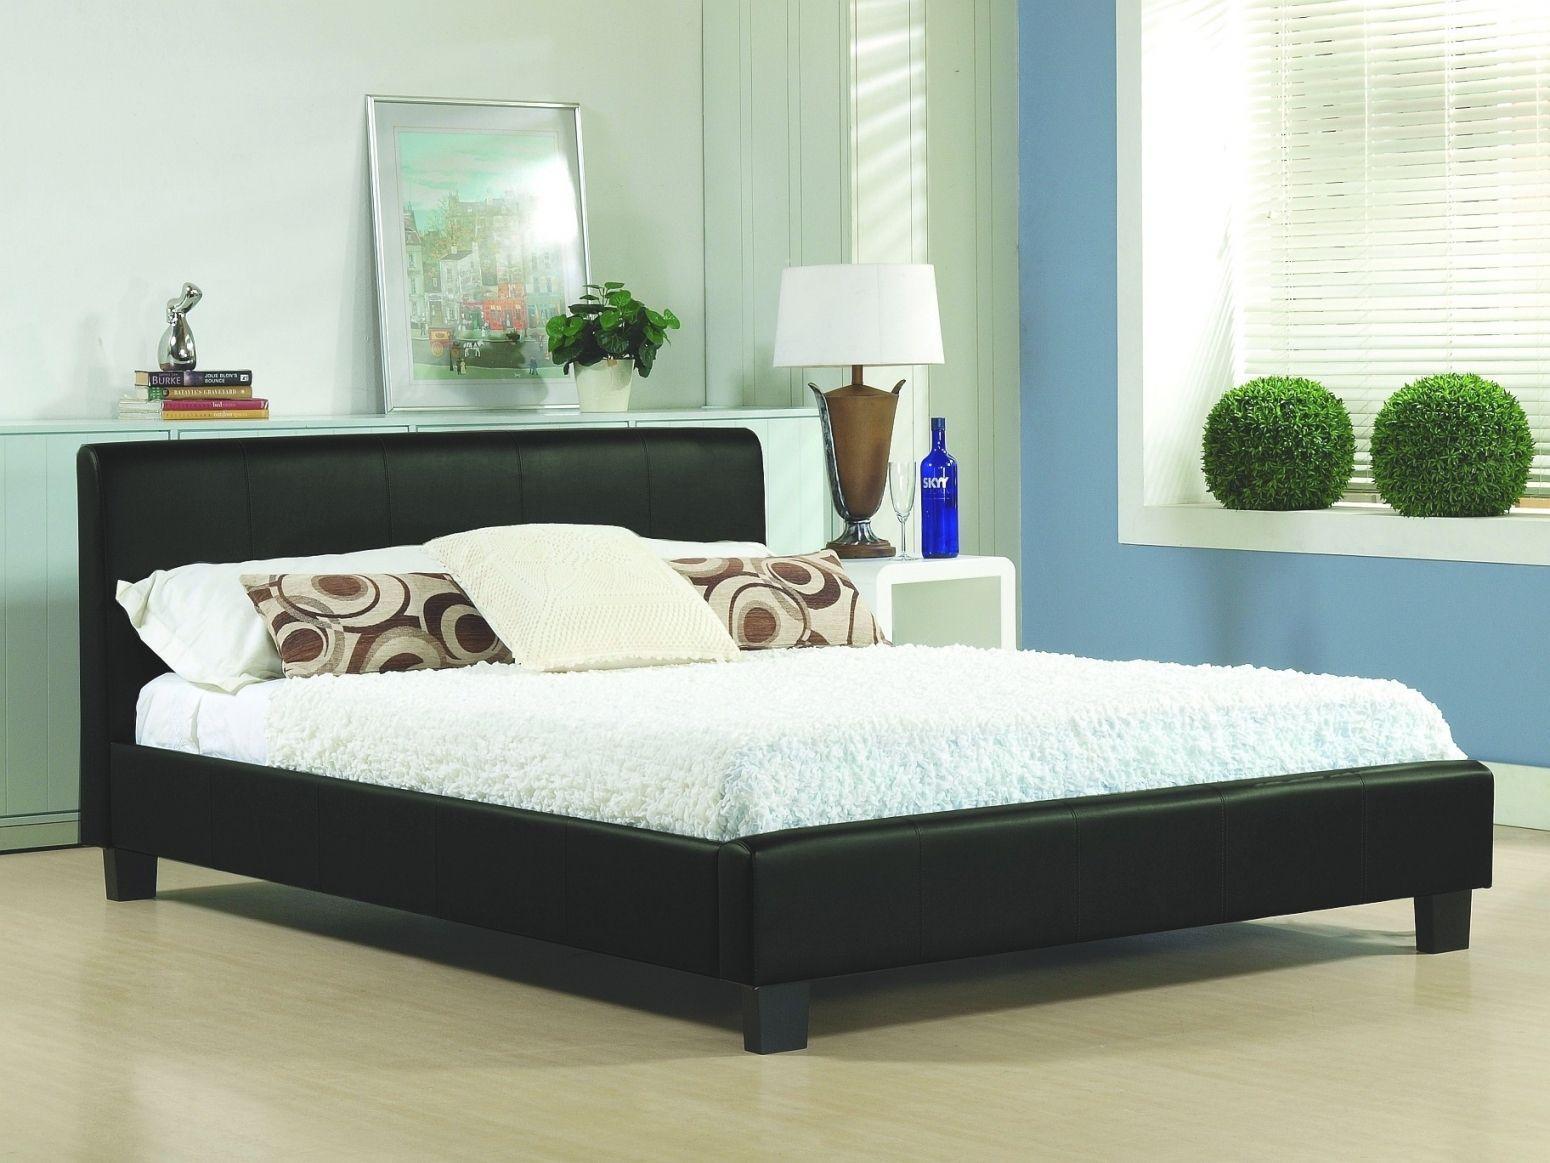 Bed Frames Alaskan King Size Frames Full Tempurpedic Mattress In